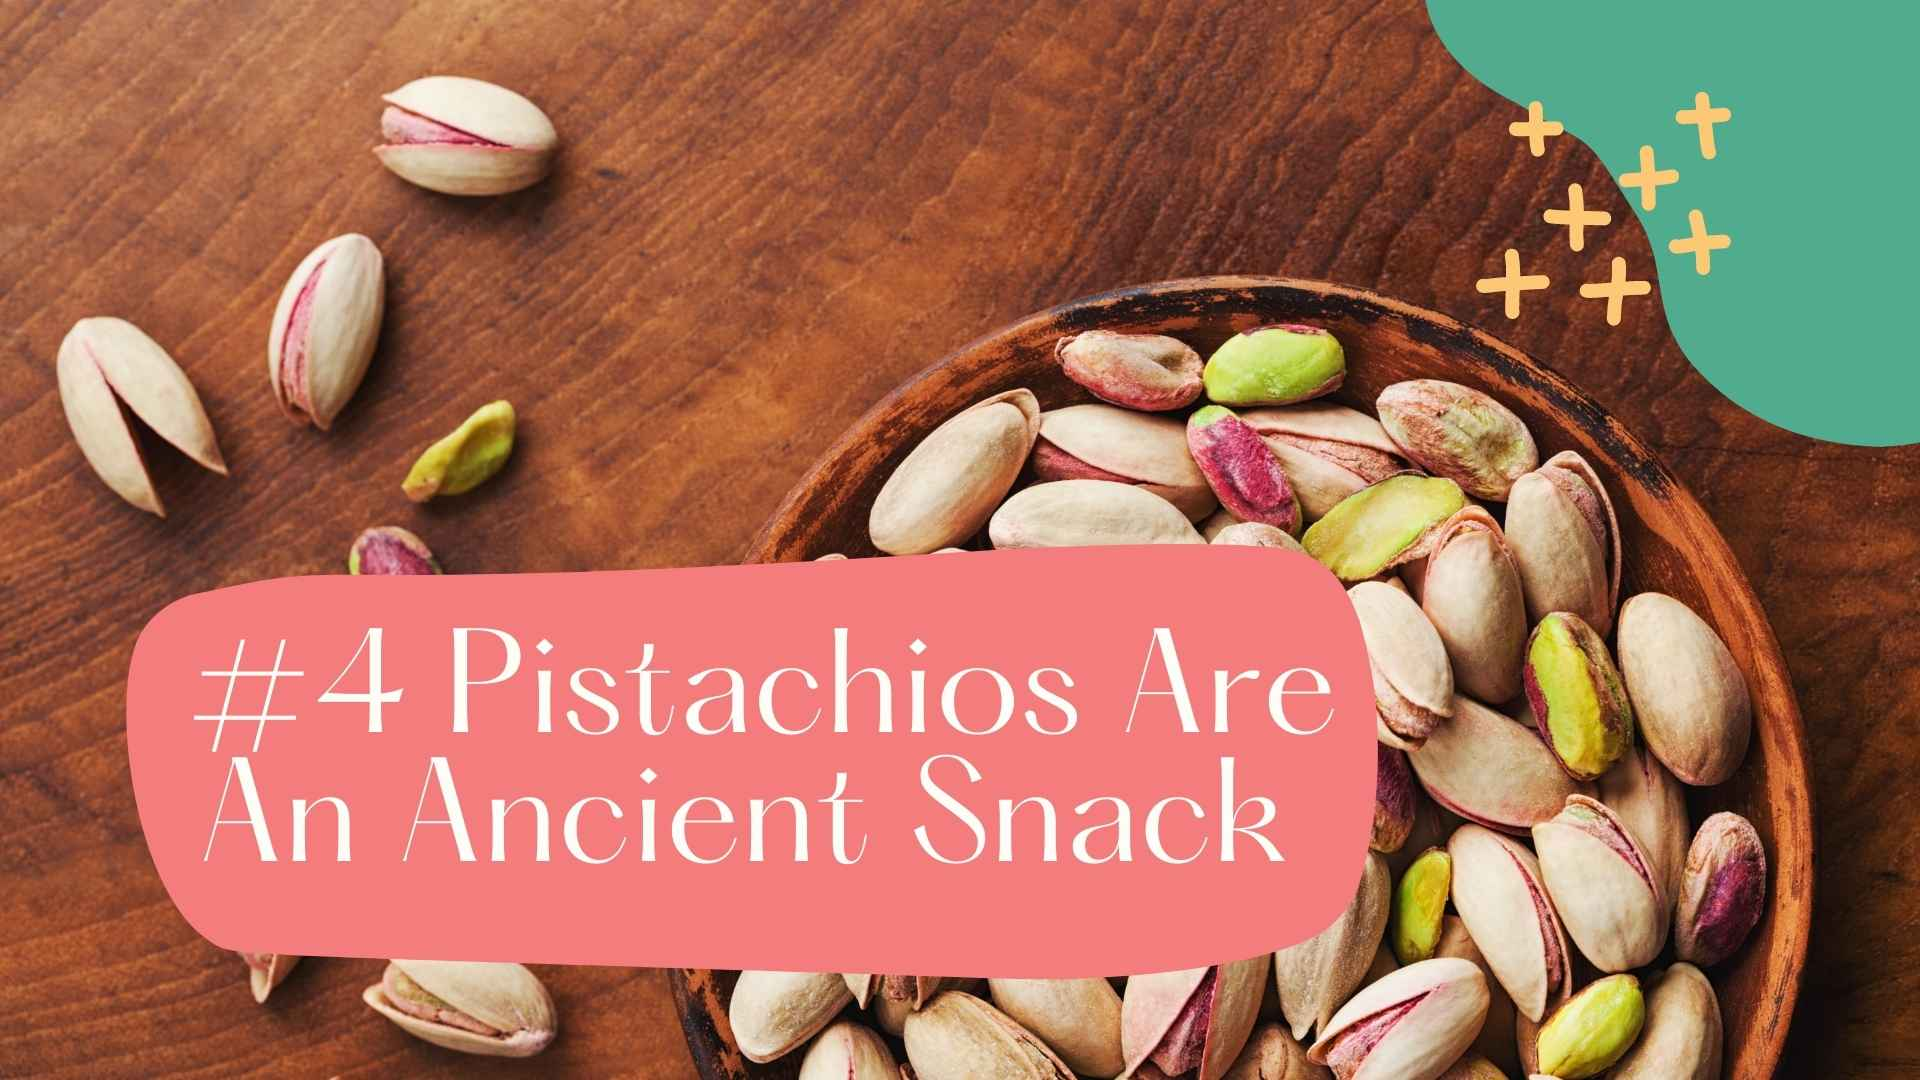 pistachios are ancient snacks